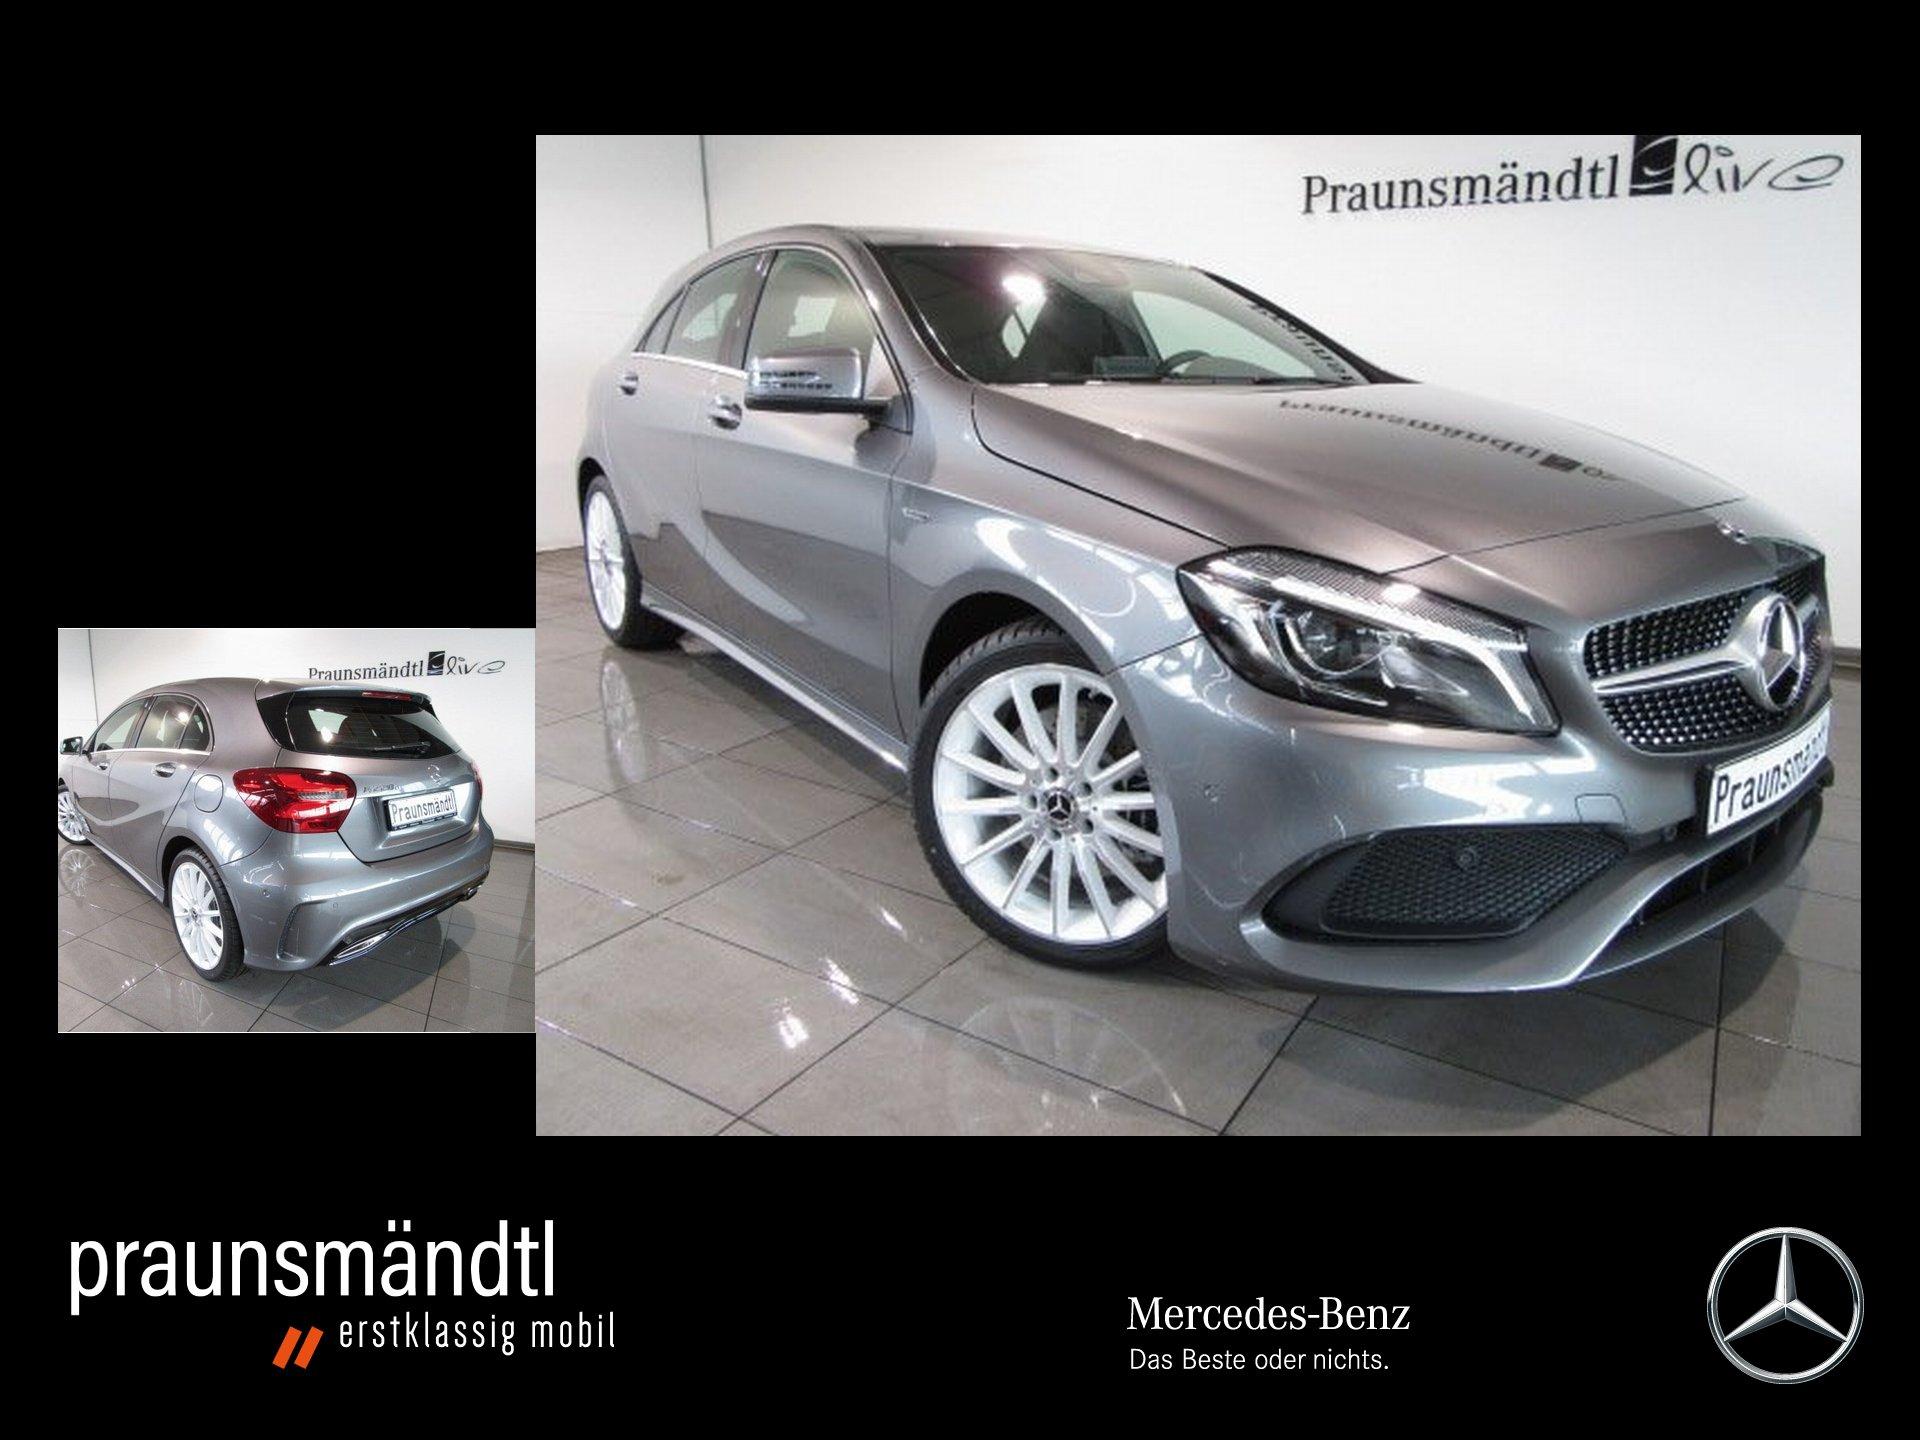 Mercedes-Benz A 220 d AMG PEAK 7ATG/LED/Navi/PTS/Kamera/SHZ/CD, Jahr 2017, Diesel